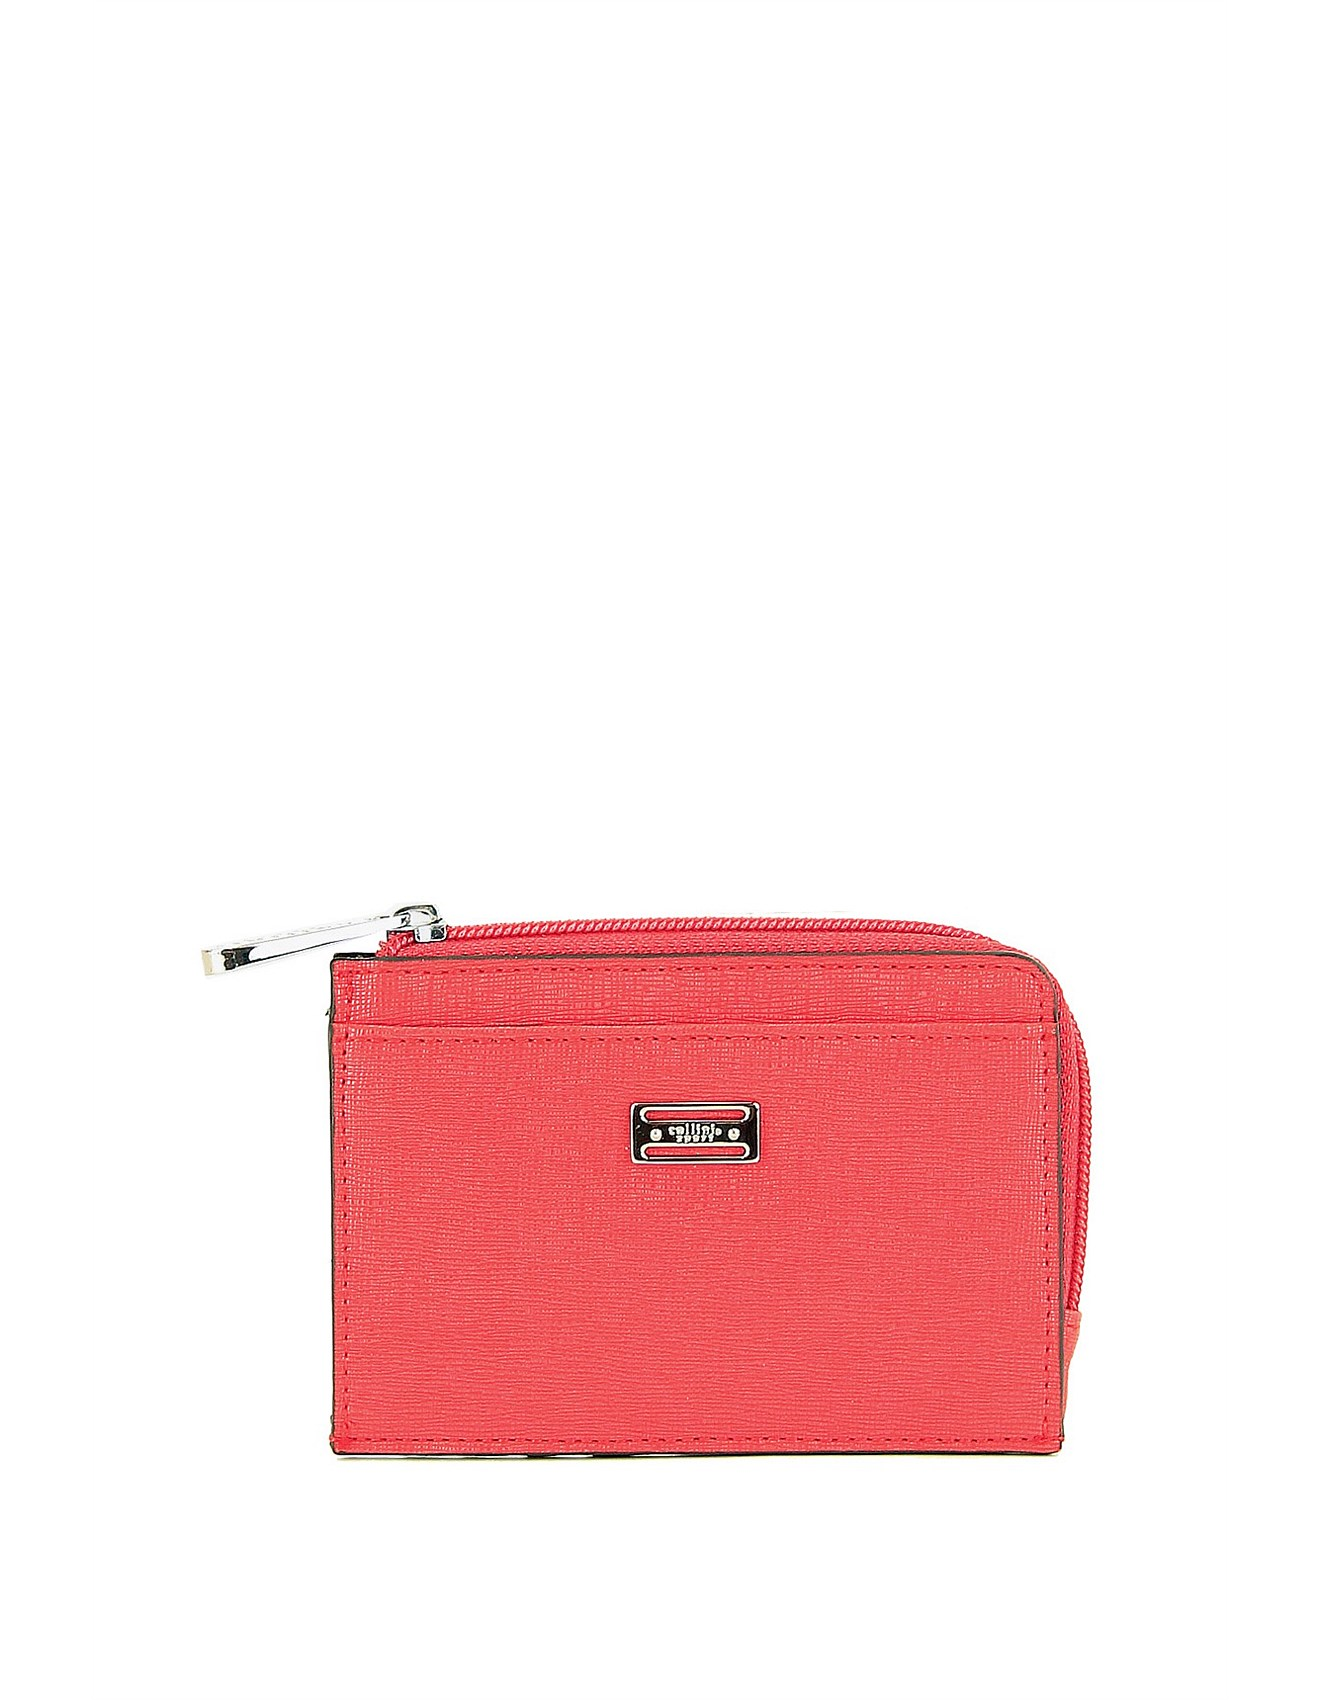 Bags   Accessories - CREDIT CARD POUCH d143bce41bd4a